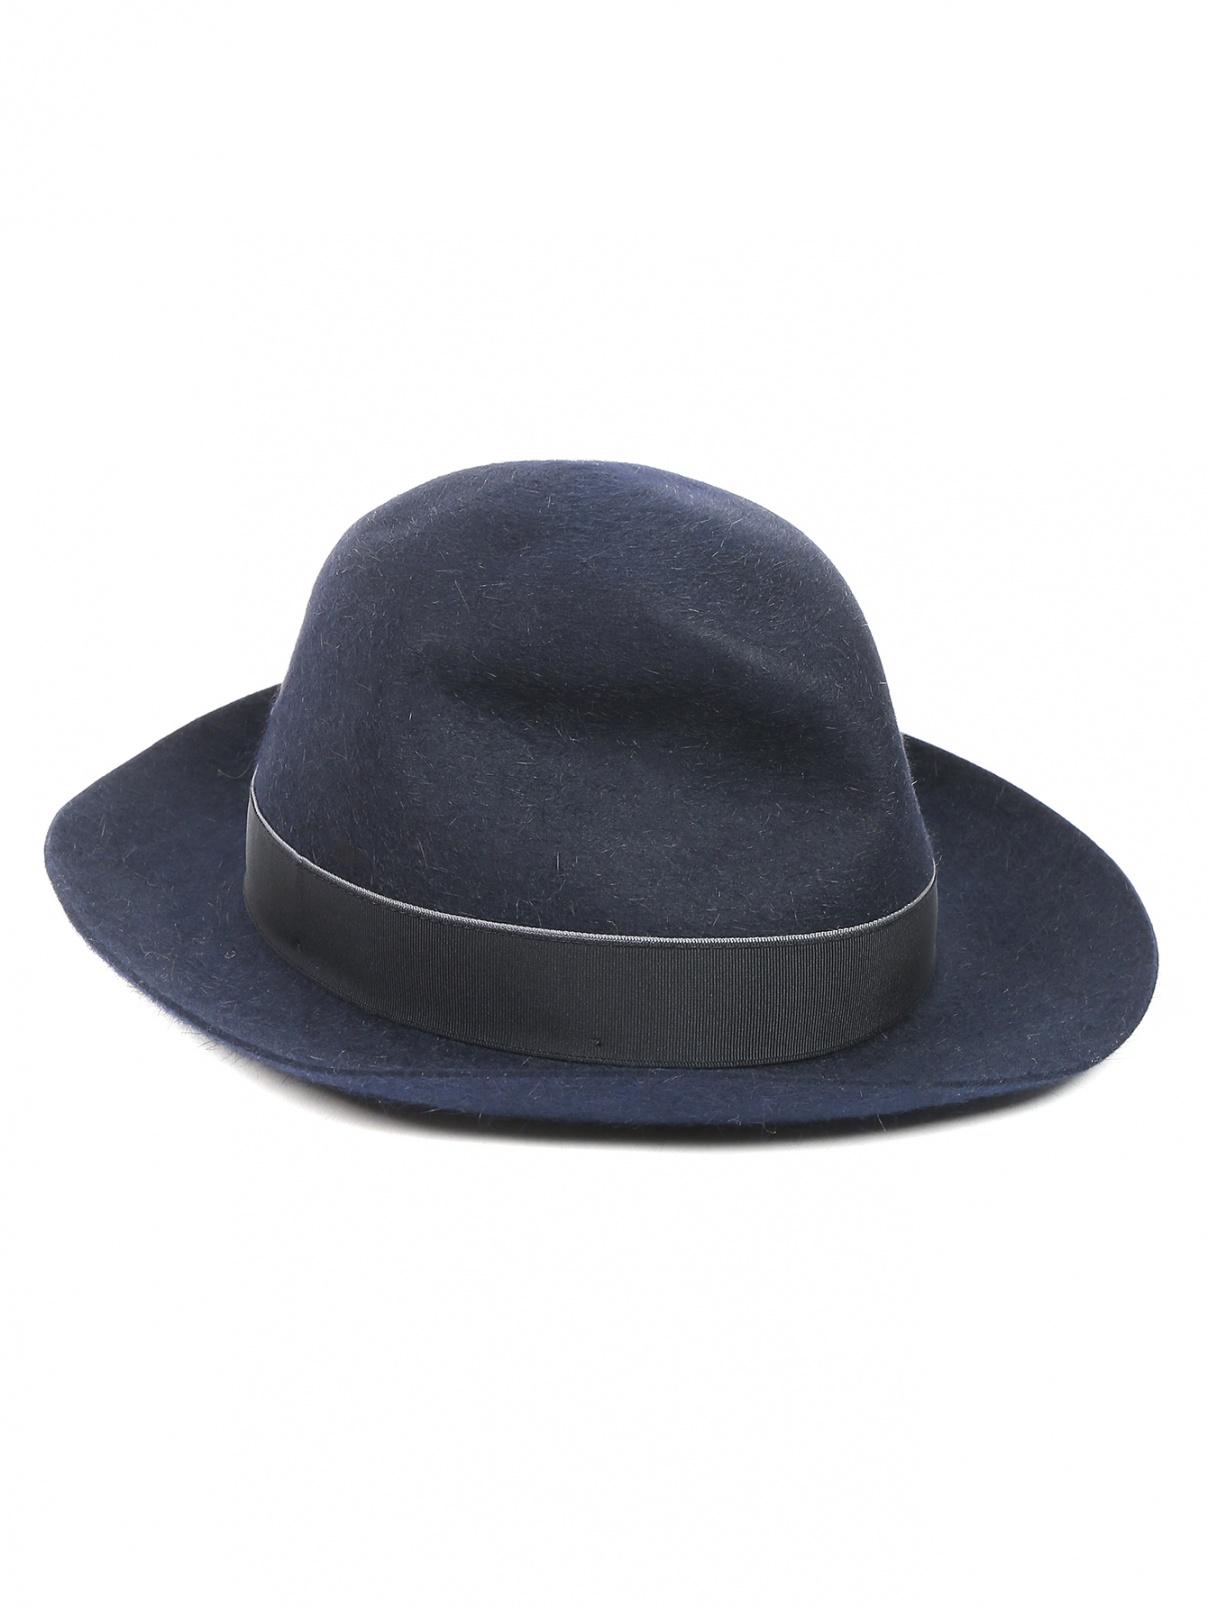 Шляпа из шерсти Borsalino  –  Общий вид  – Цвет:  Синий